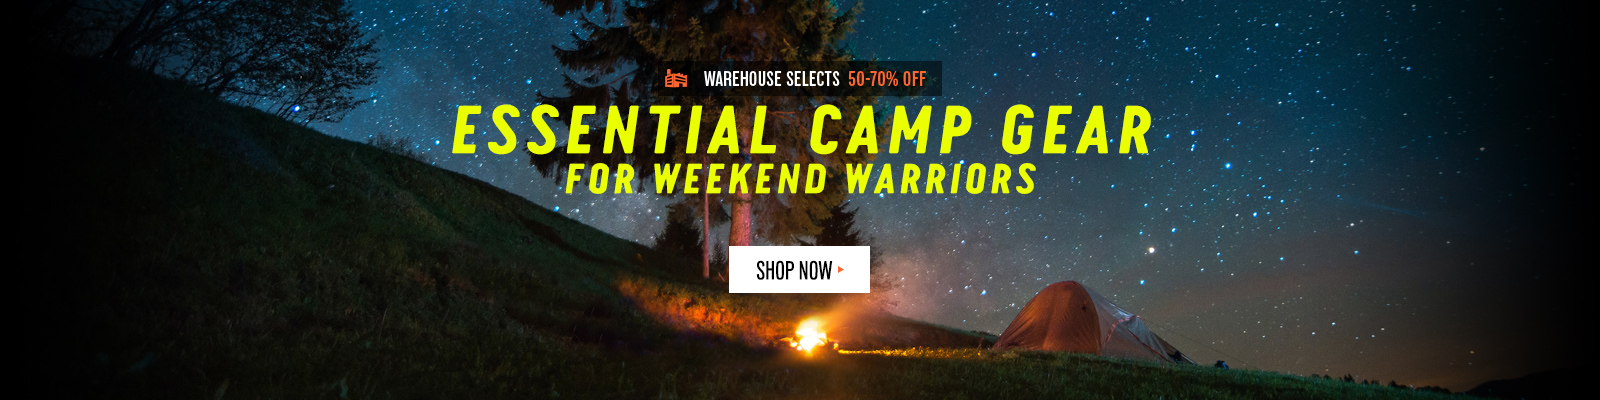 August-Essential-Camp-Gear_1600x400_2.jpg